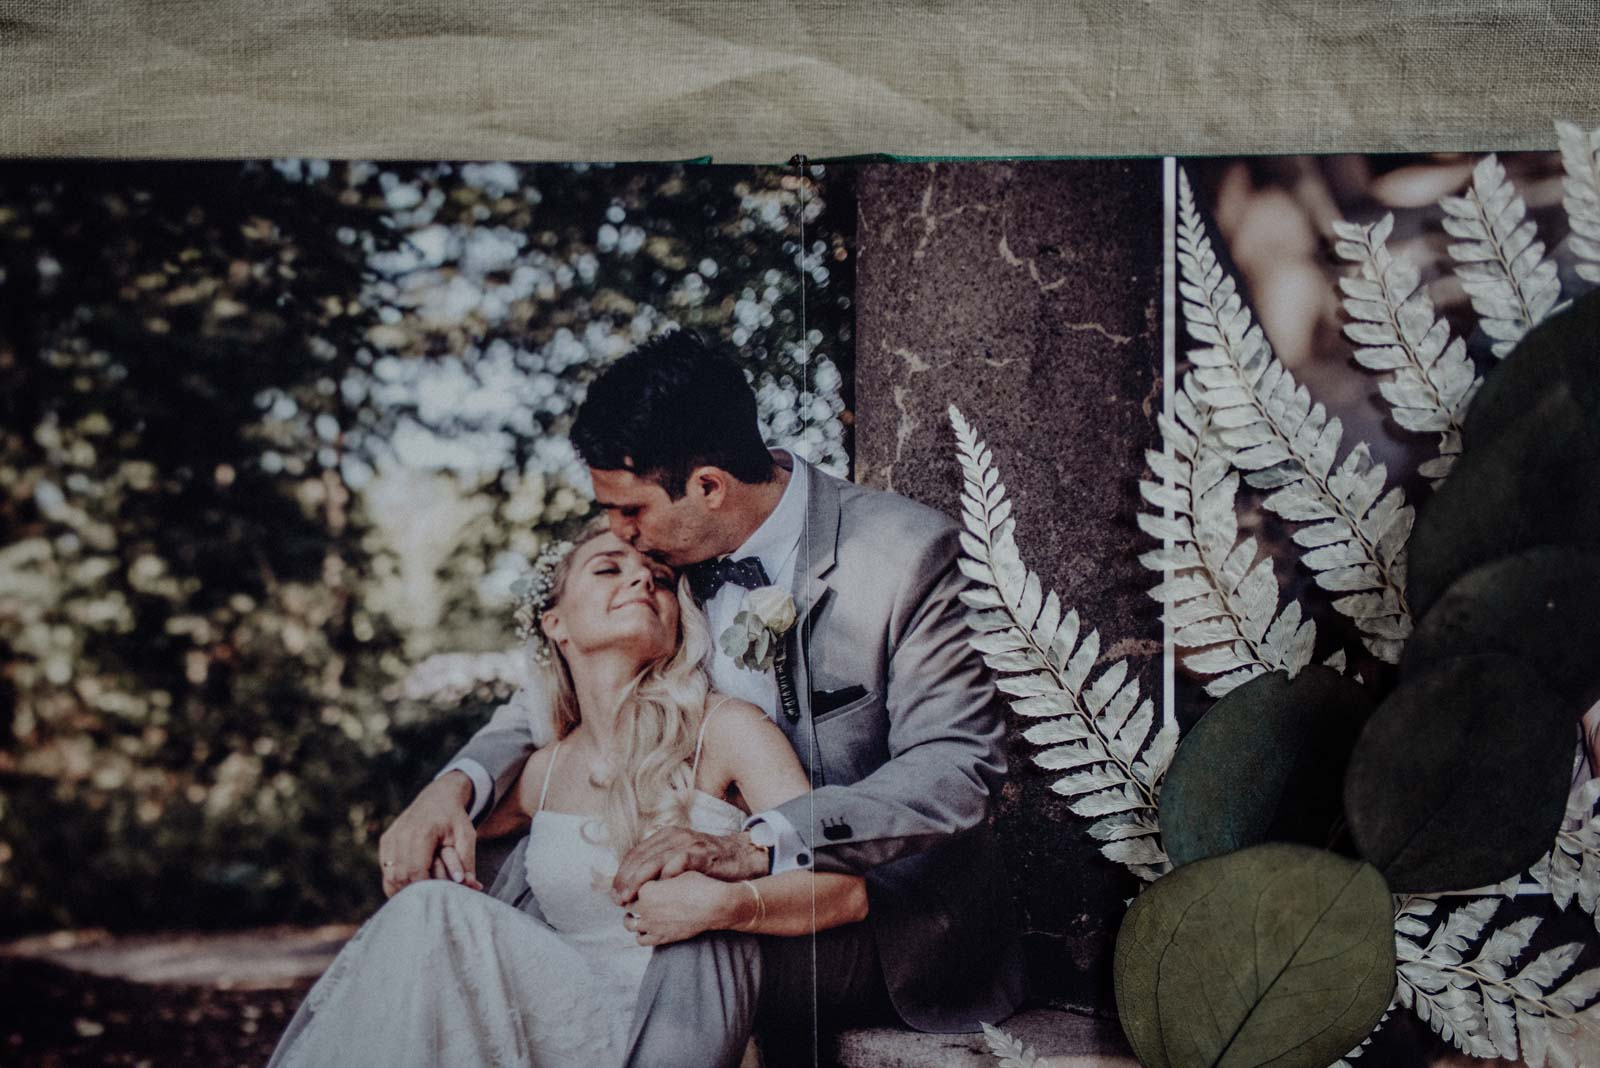 053-Fotoalbum-Fotobuch-Premium-Fotograf-Witten-Luxus